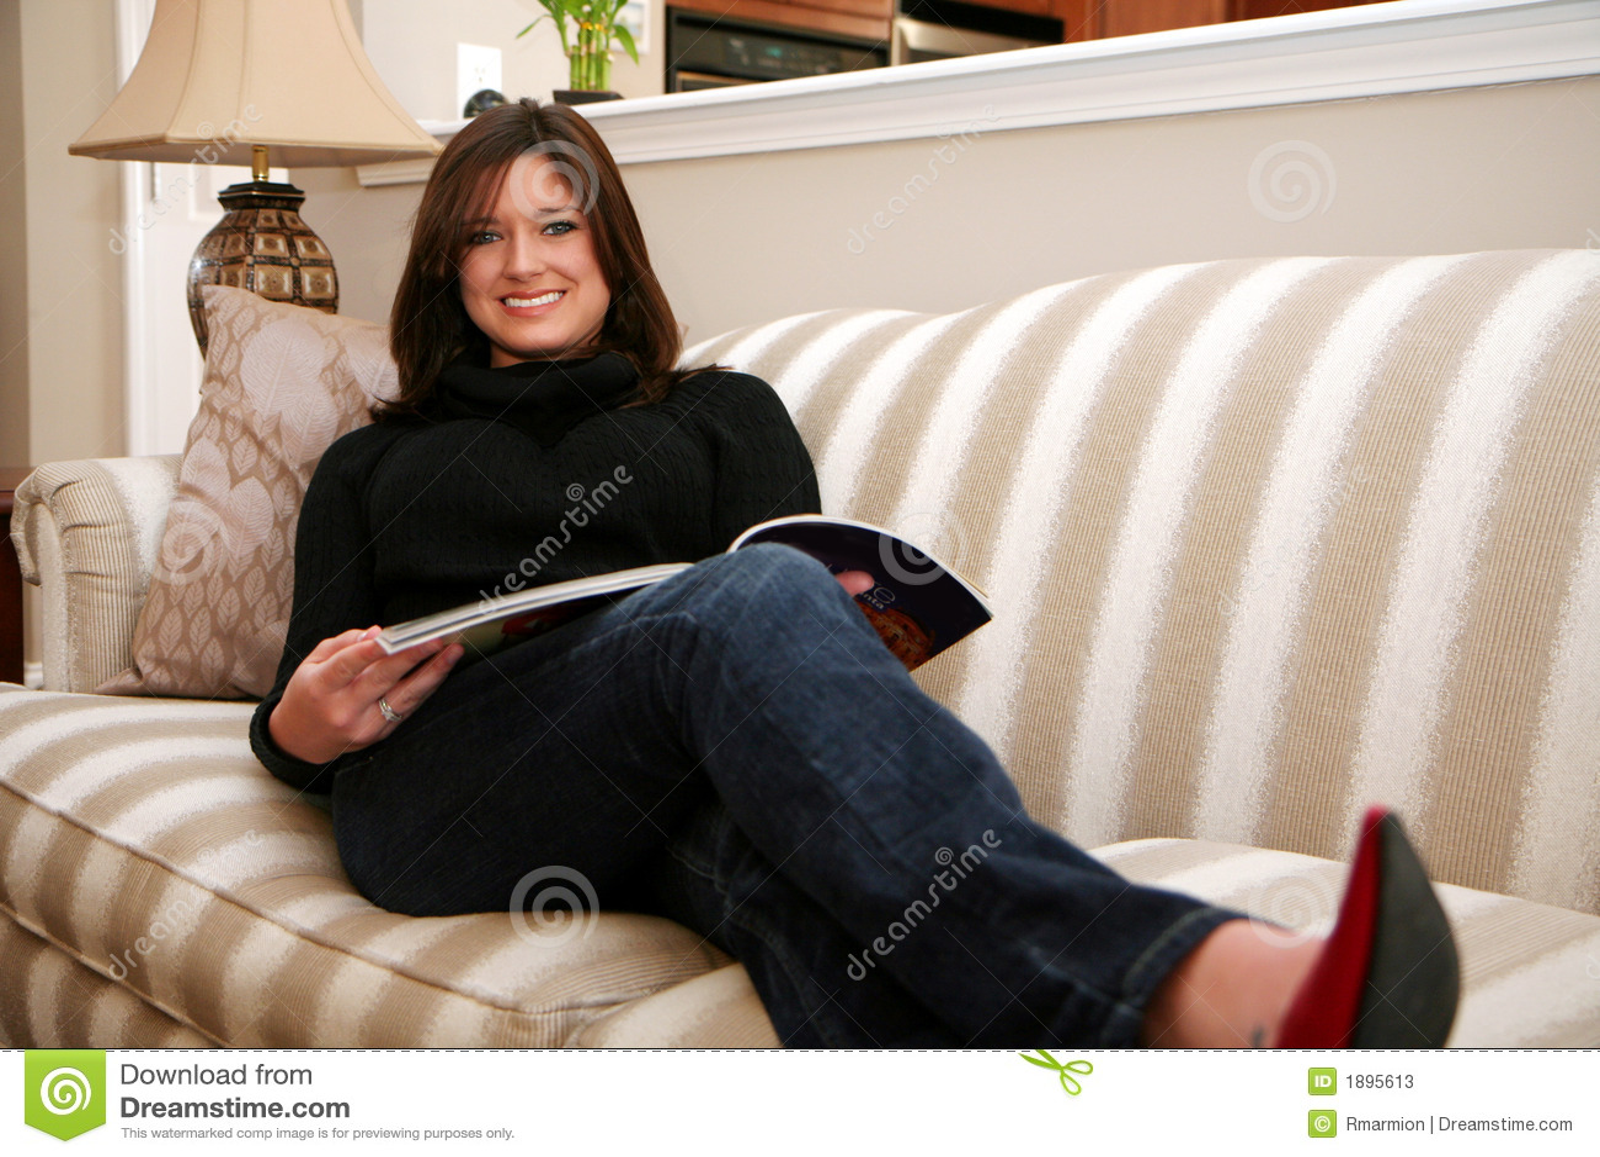 reading a magazine stock photos image 1895613. Black Bedroom Furniture Sets. Home Design Ideas